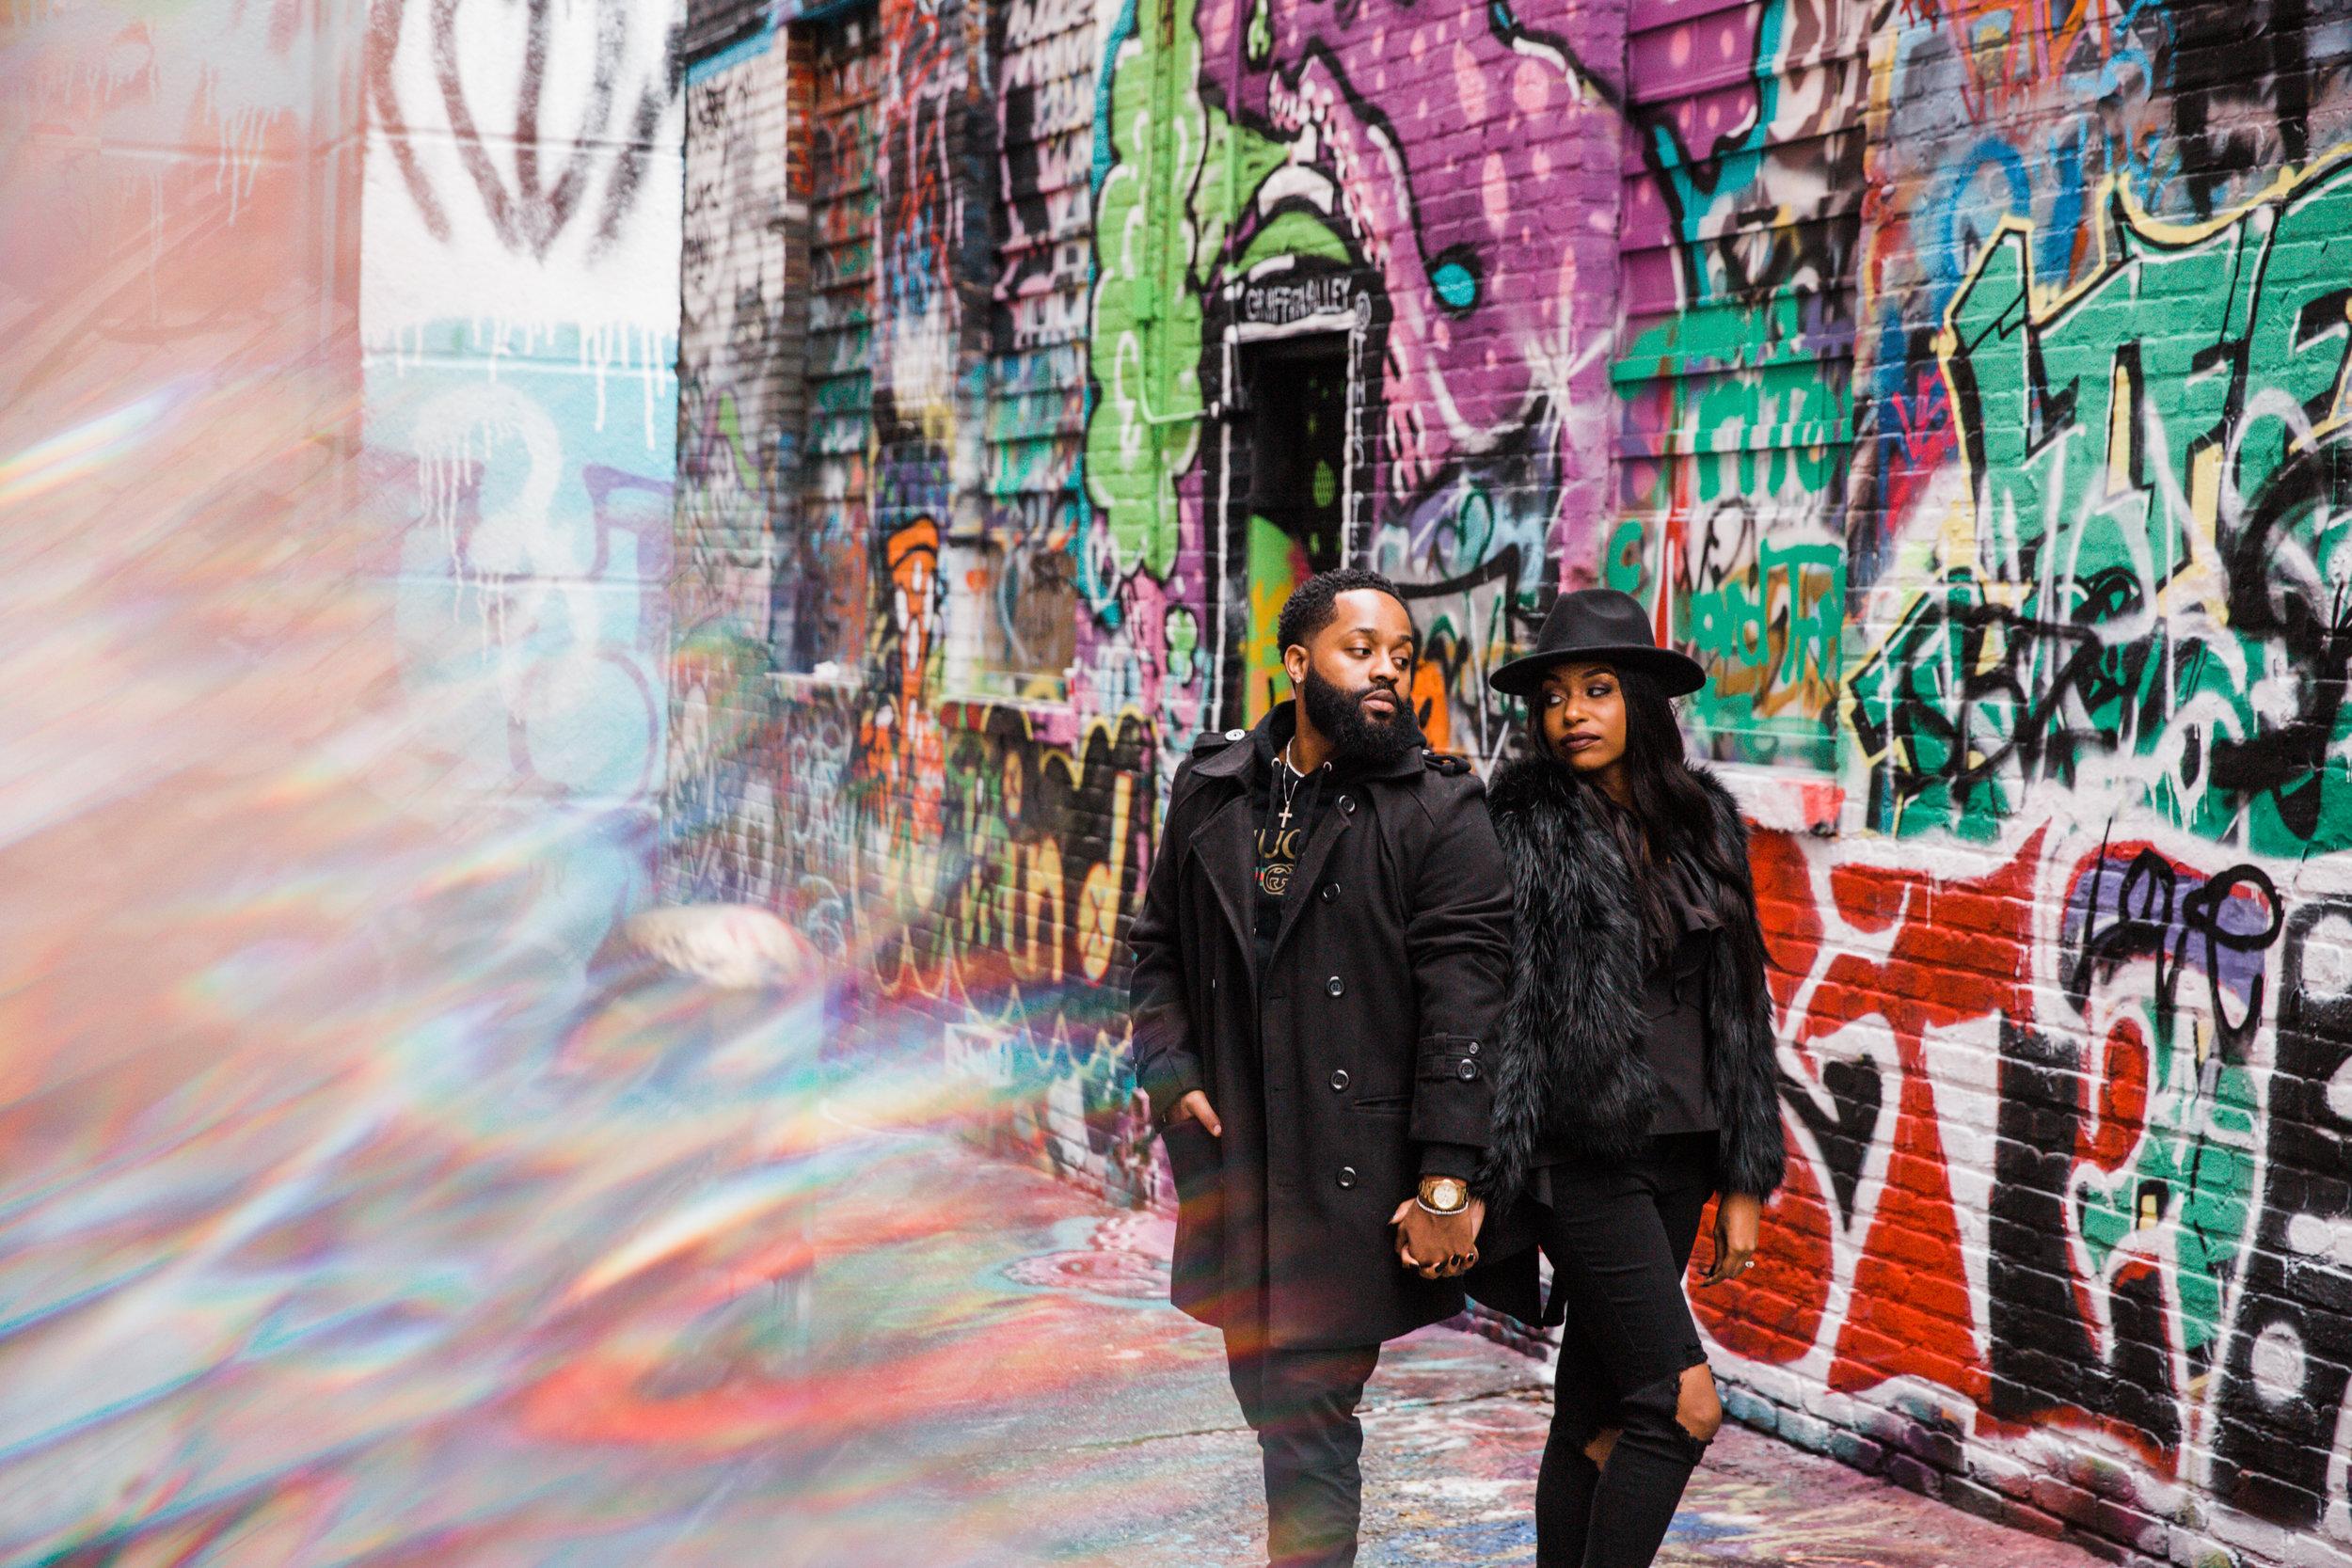 Creative Baltimore Graffiti Alley Engagement Session Megapixels Media Photography-39.jpg